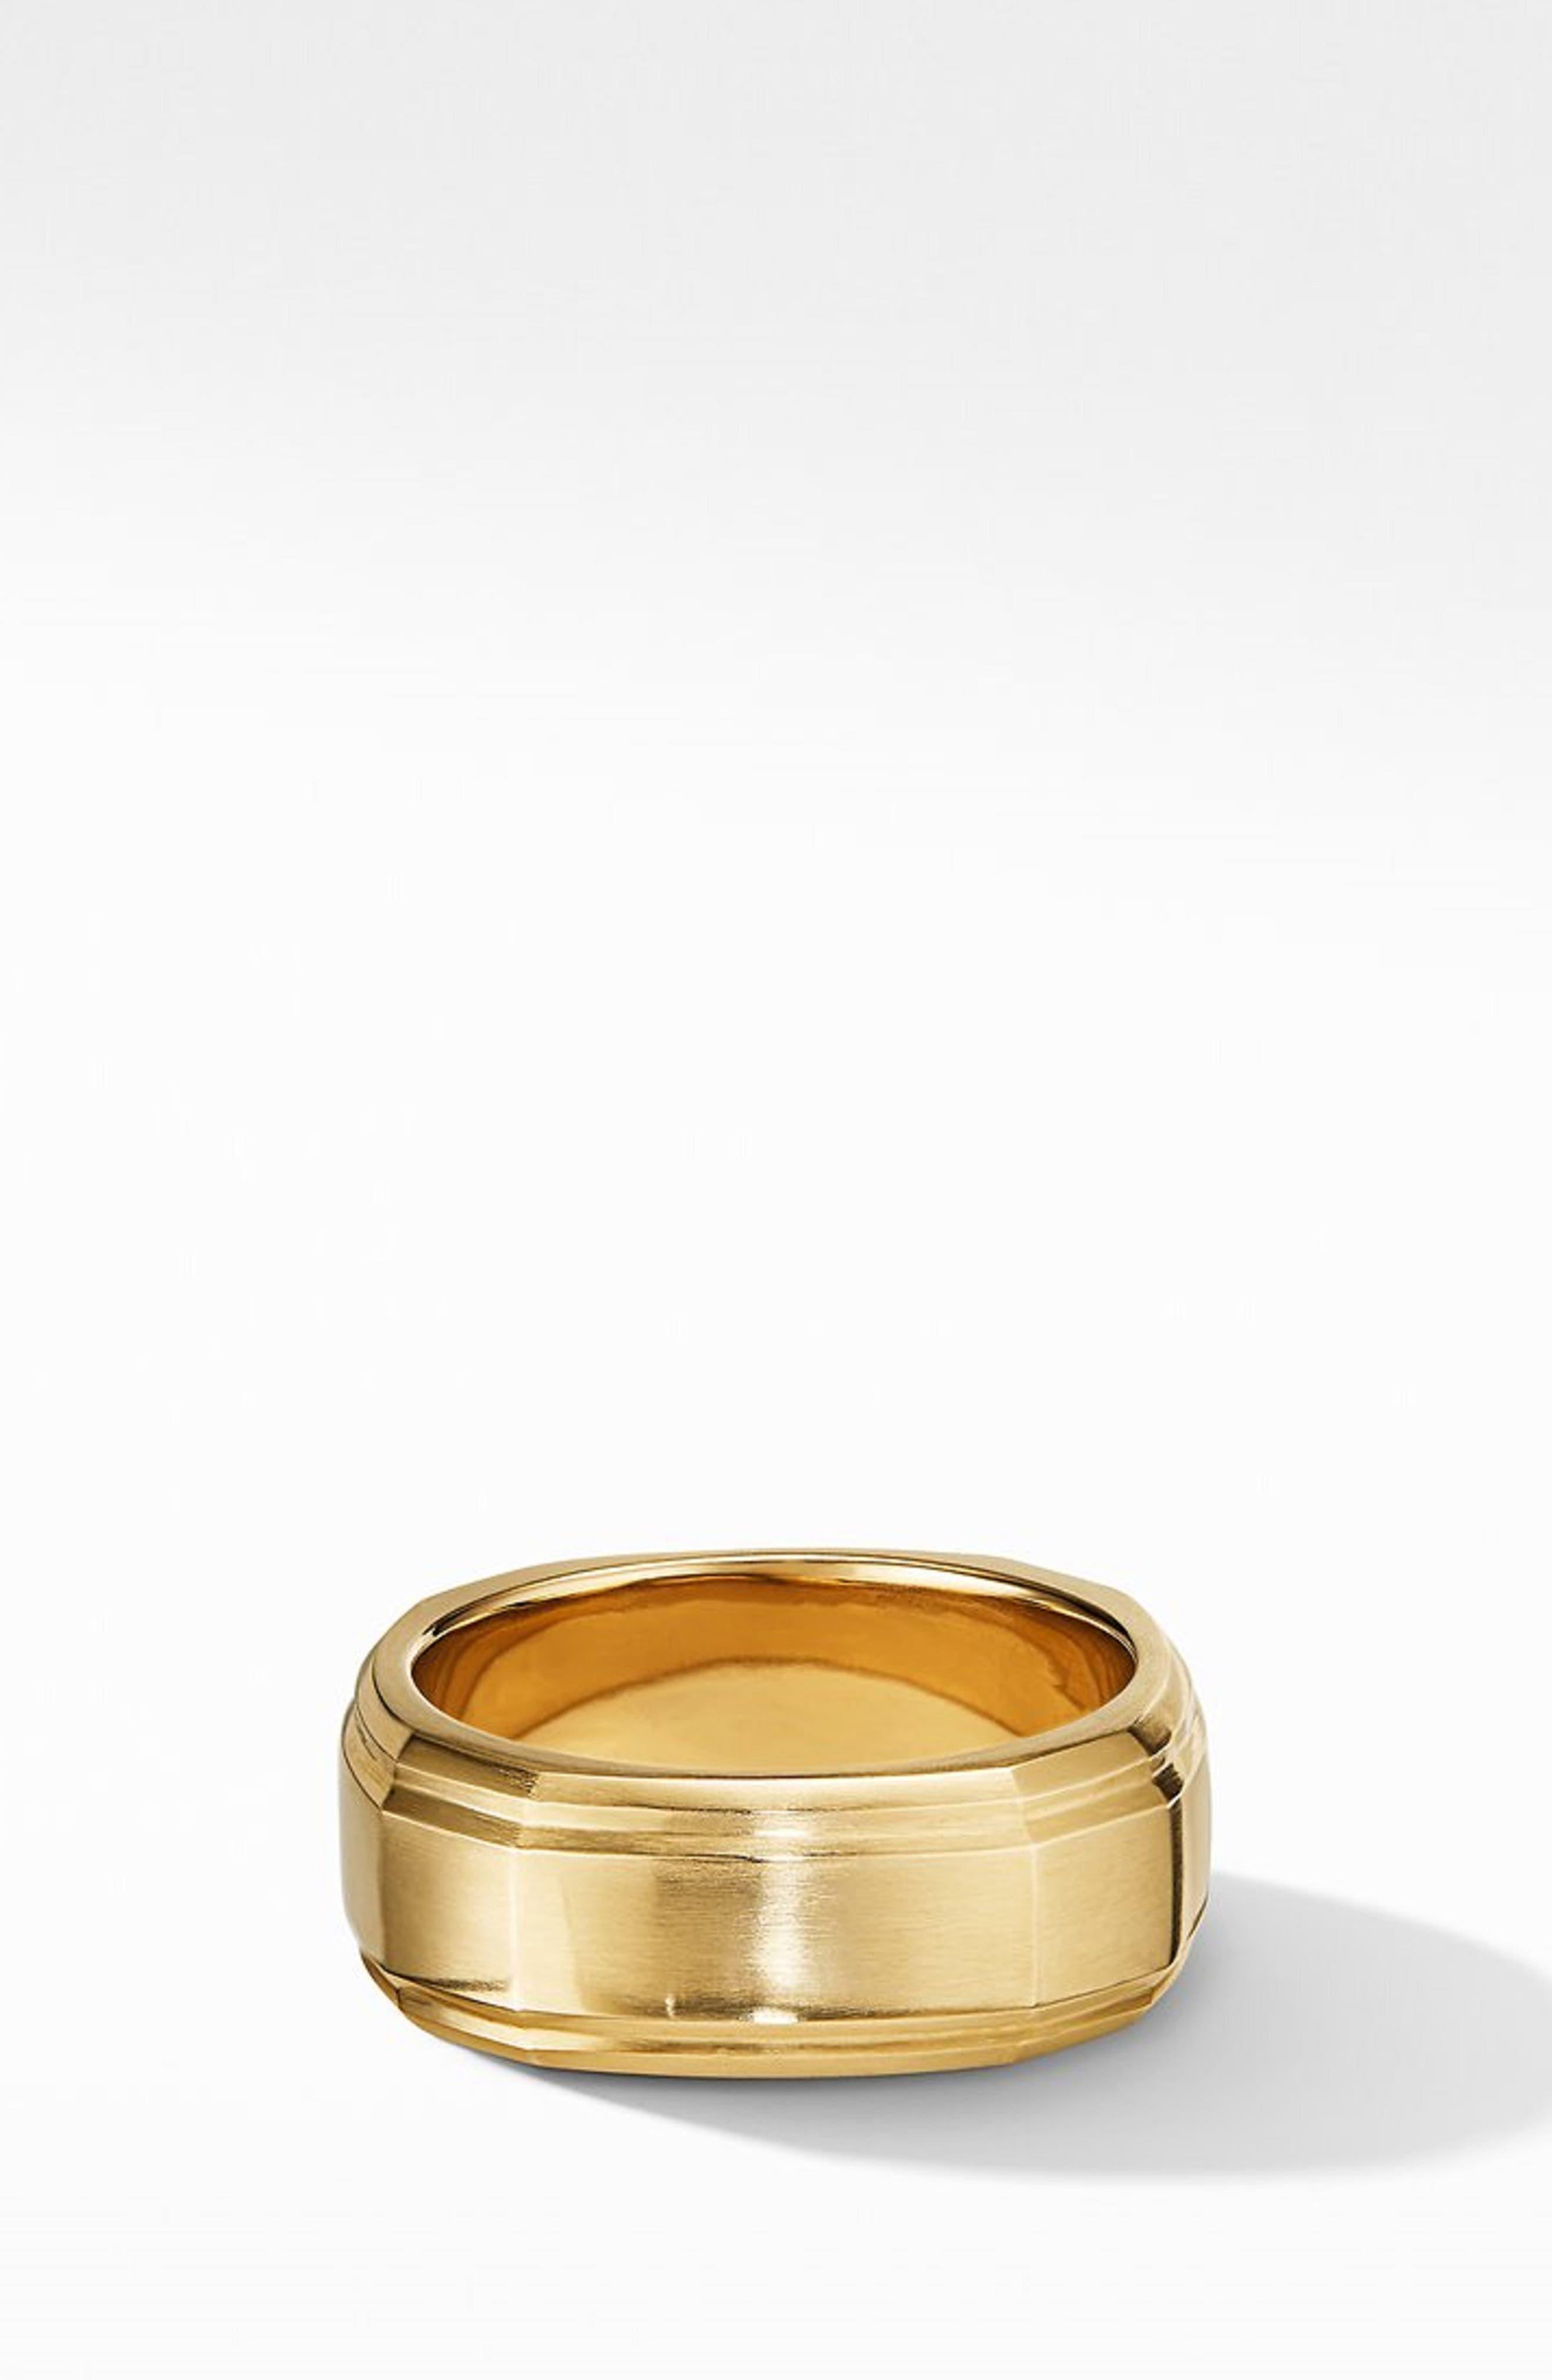 18K Gold Deco Band Ring,                             Alternate thumbnail 3, color,                             GOLD